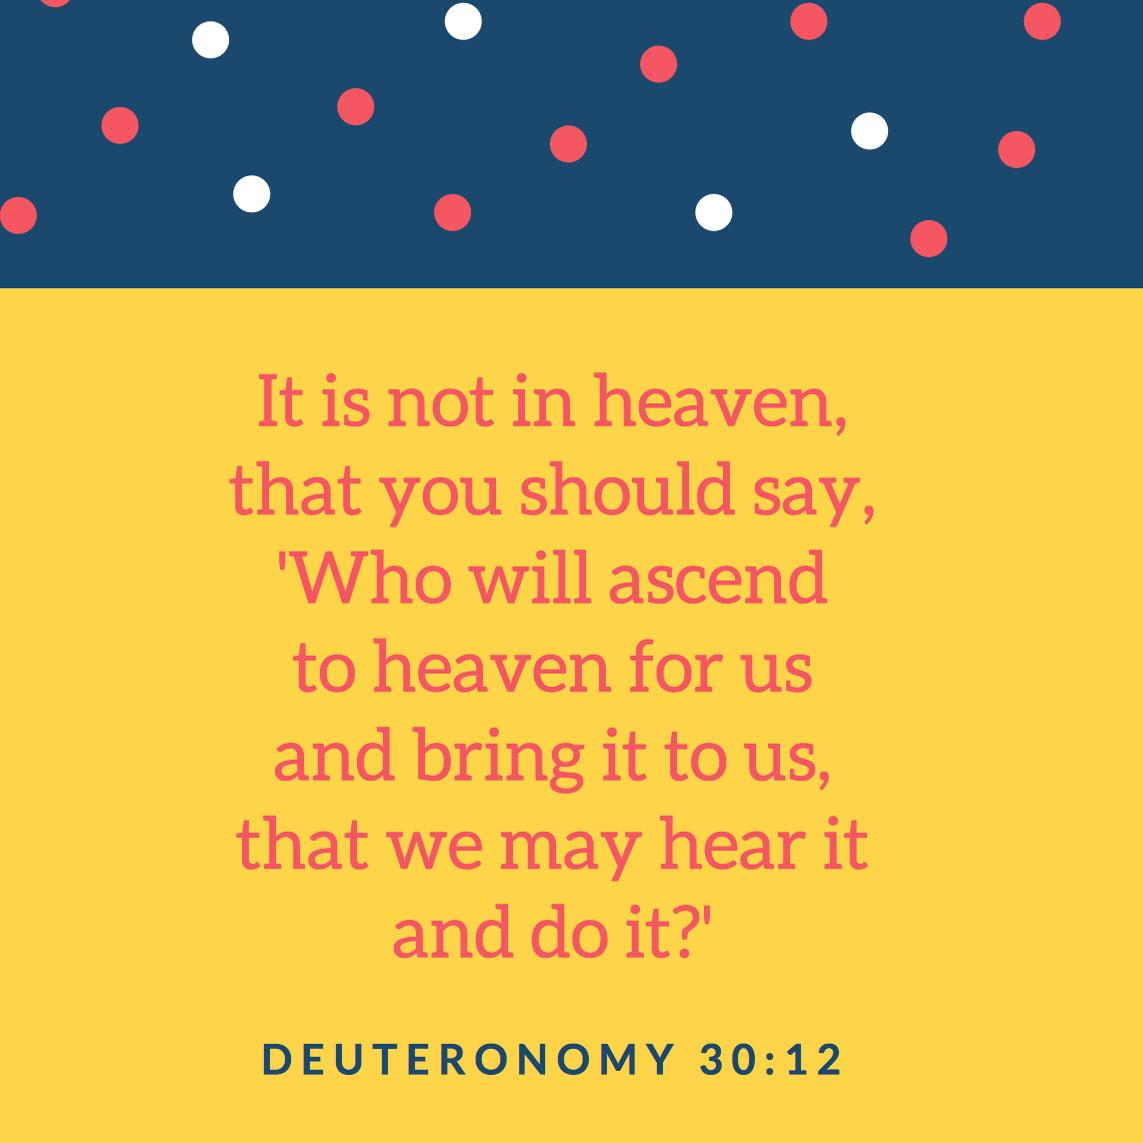 Tips for Memorizing Deuteronomy 30:12